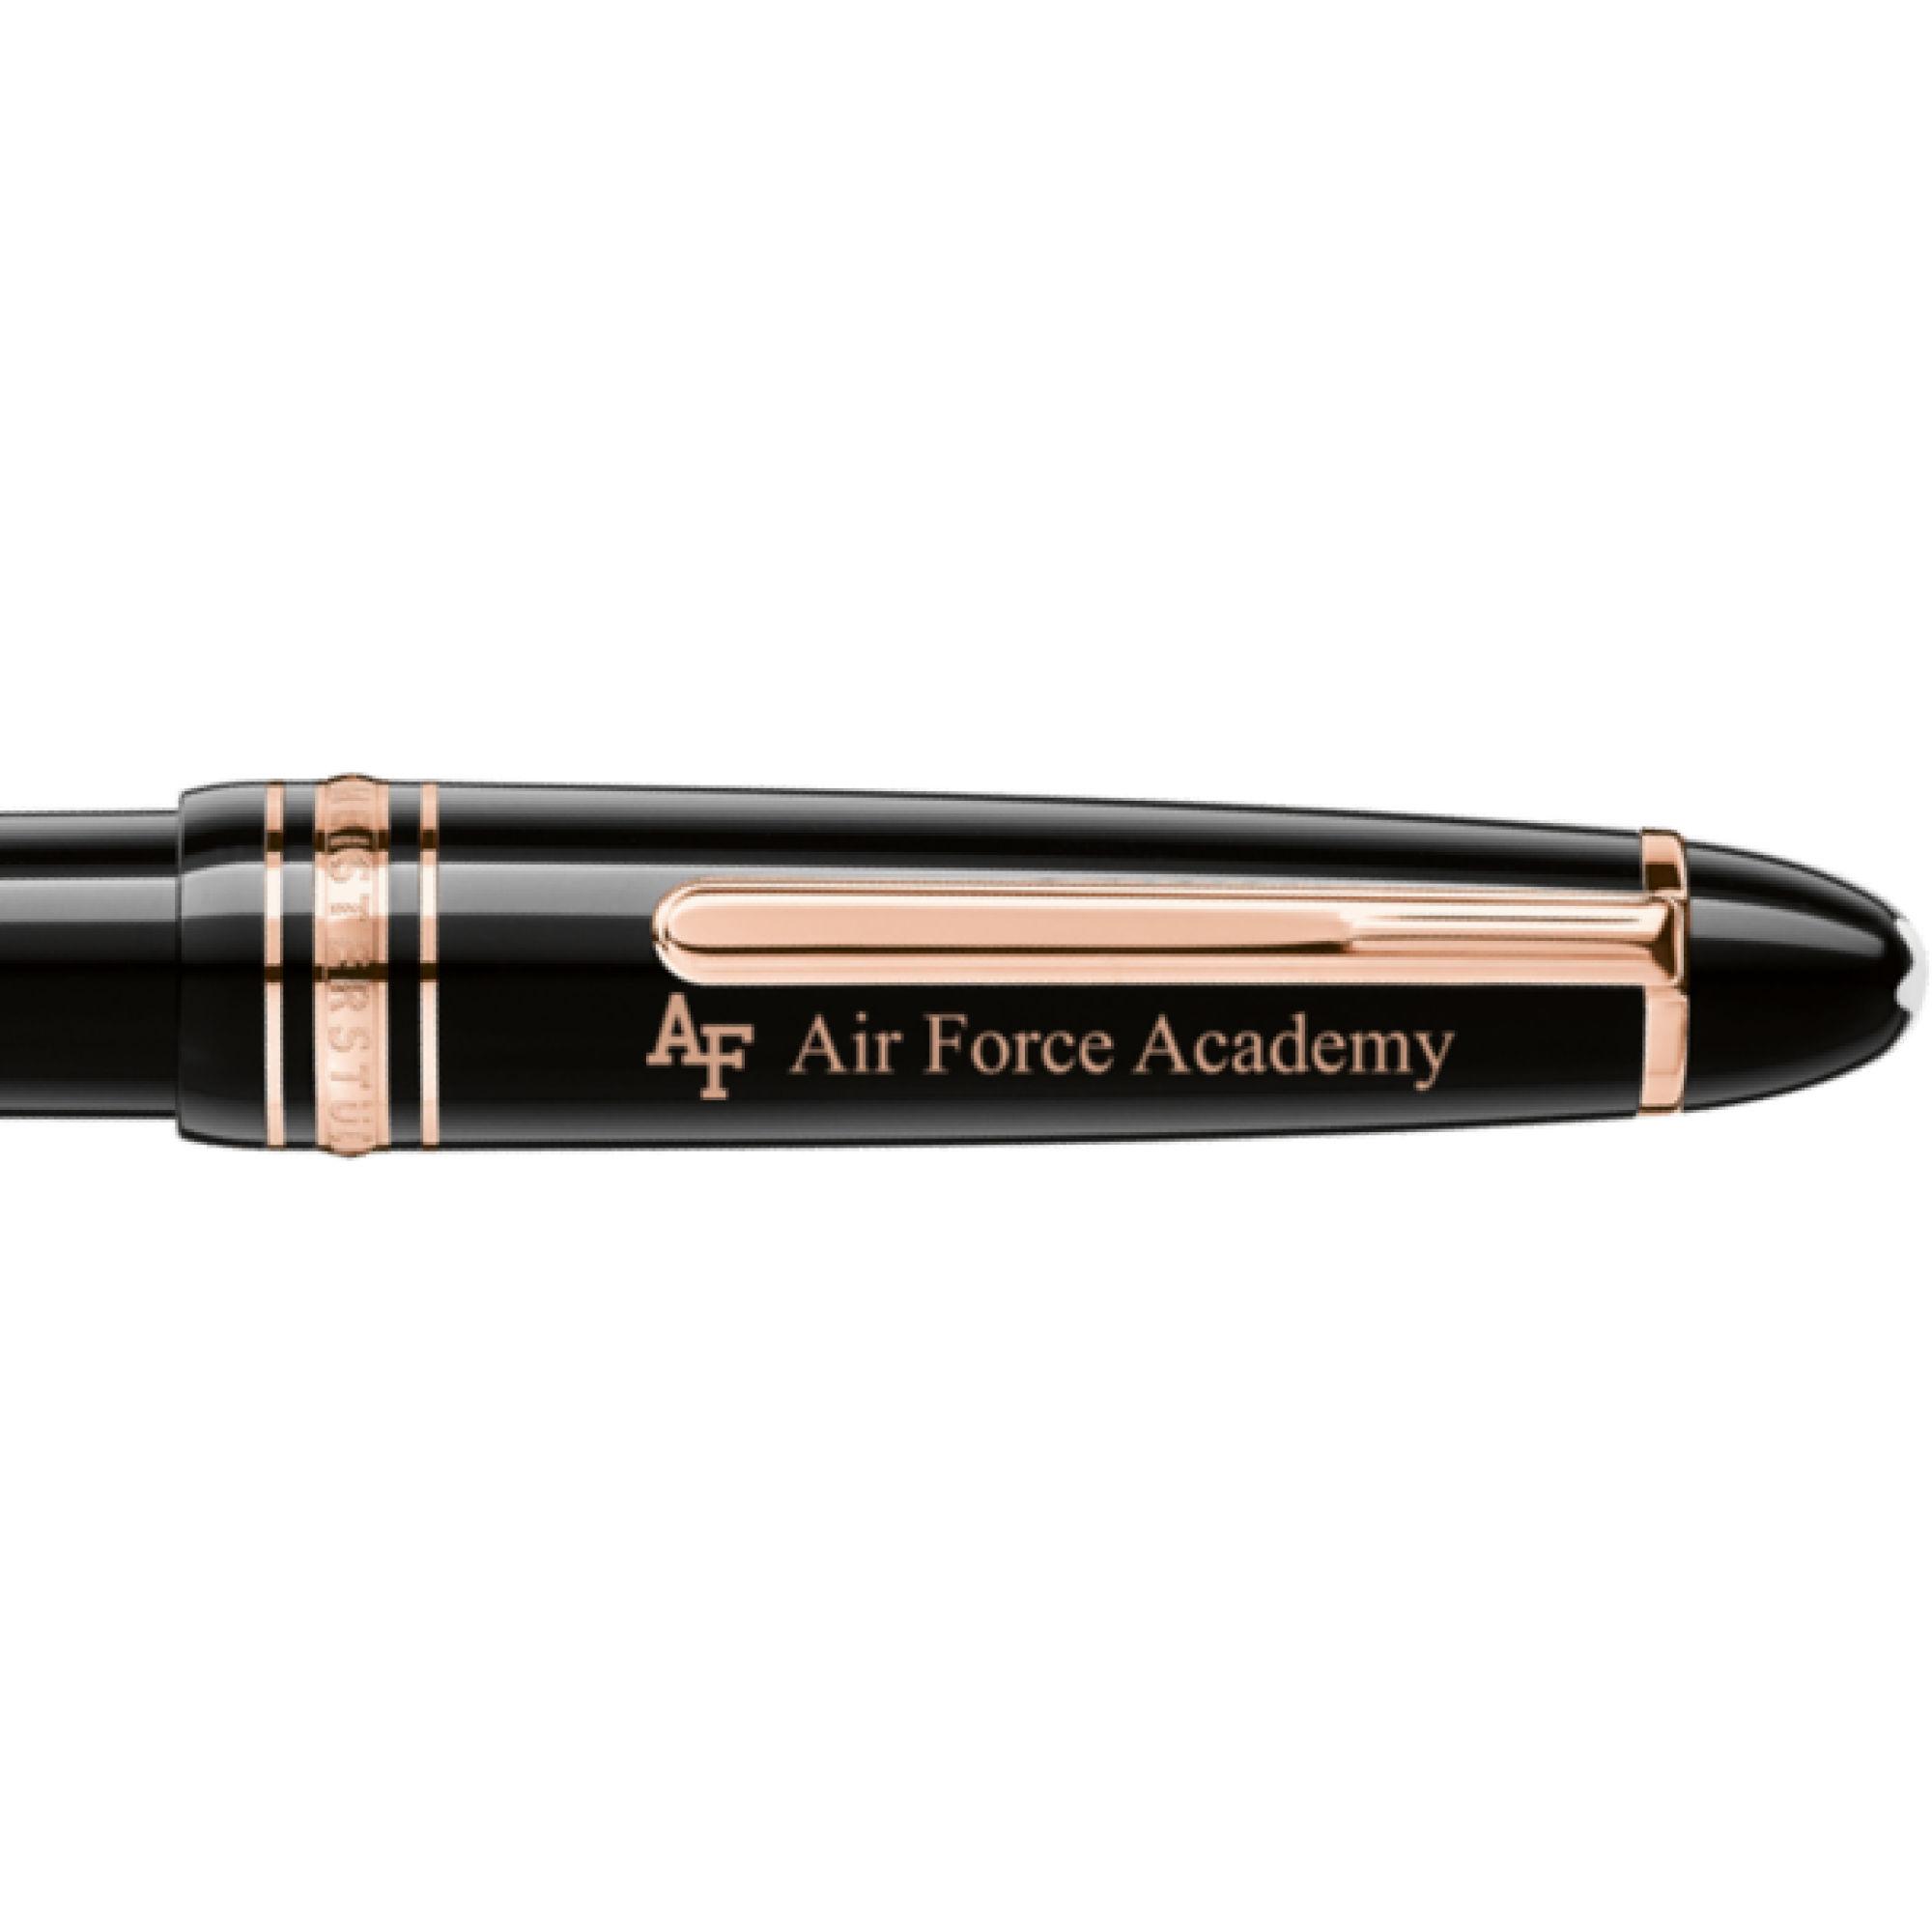 US Air Force Academy Montblanc Meisterstück LeGrand Ballpoint Pen in Red Gold